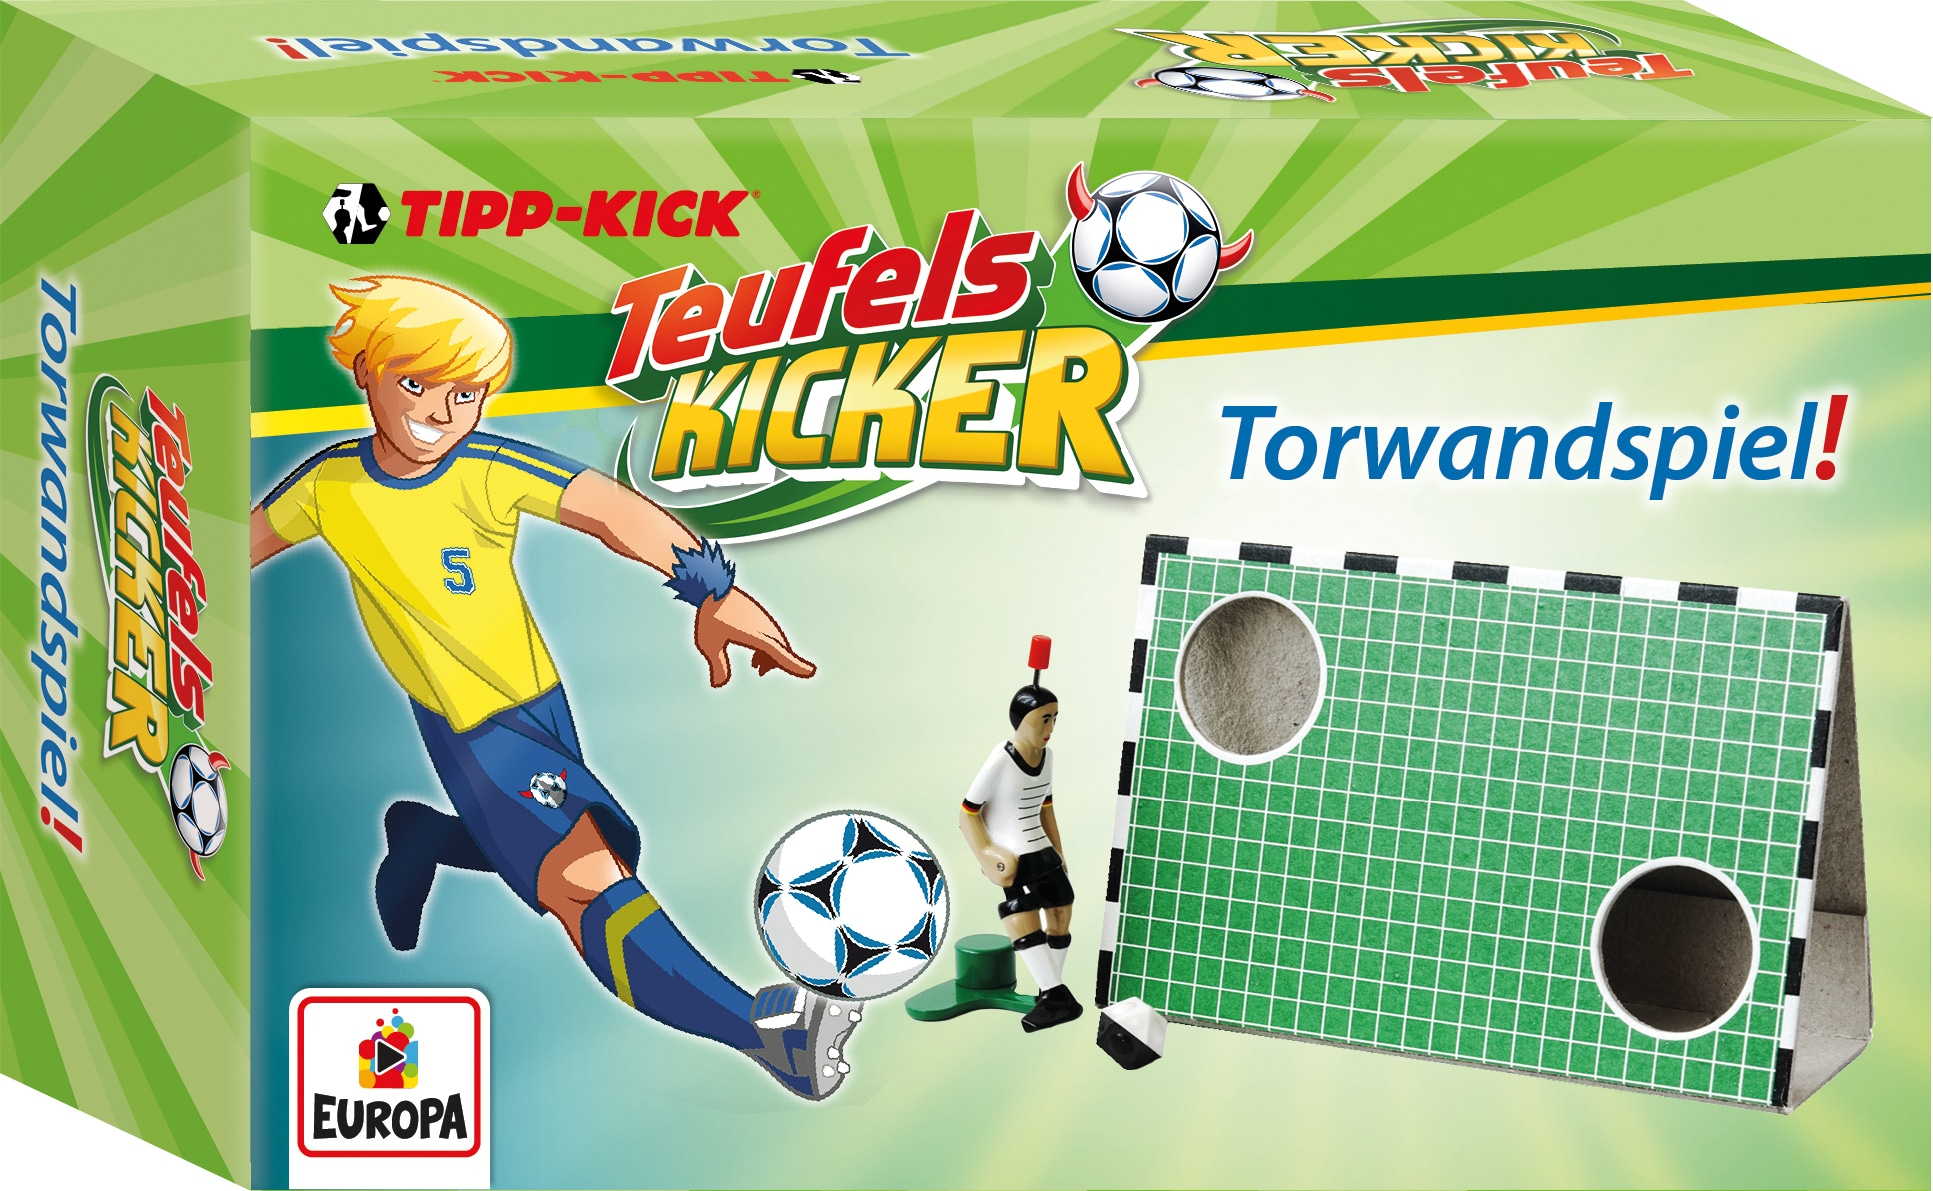 Teufelskicker-Tipp-Kick